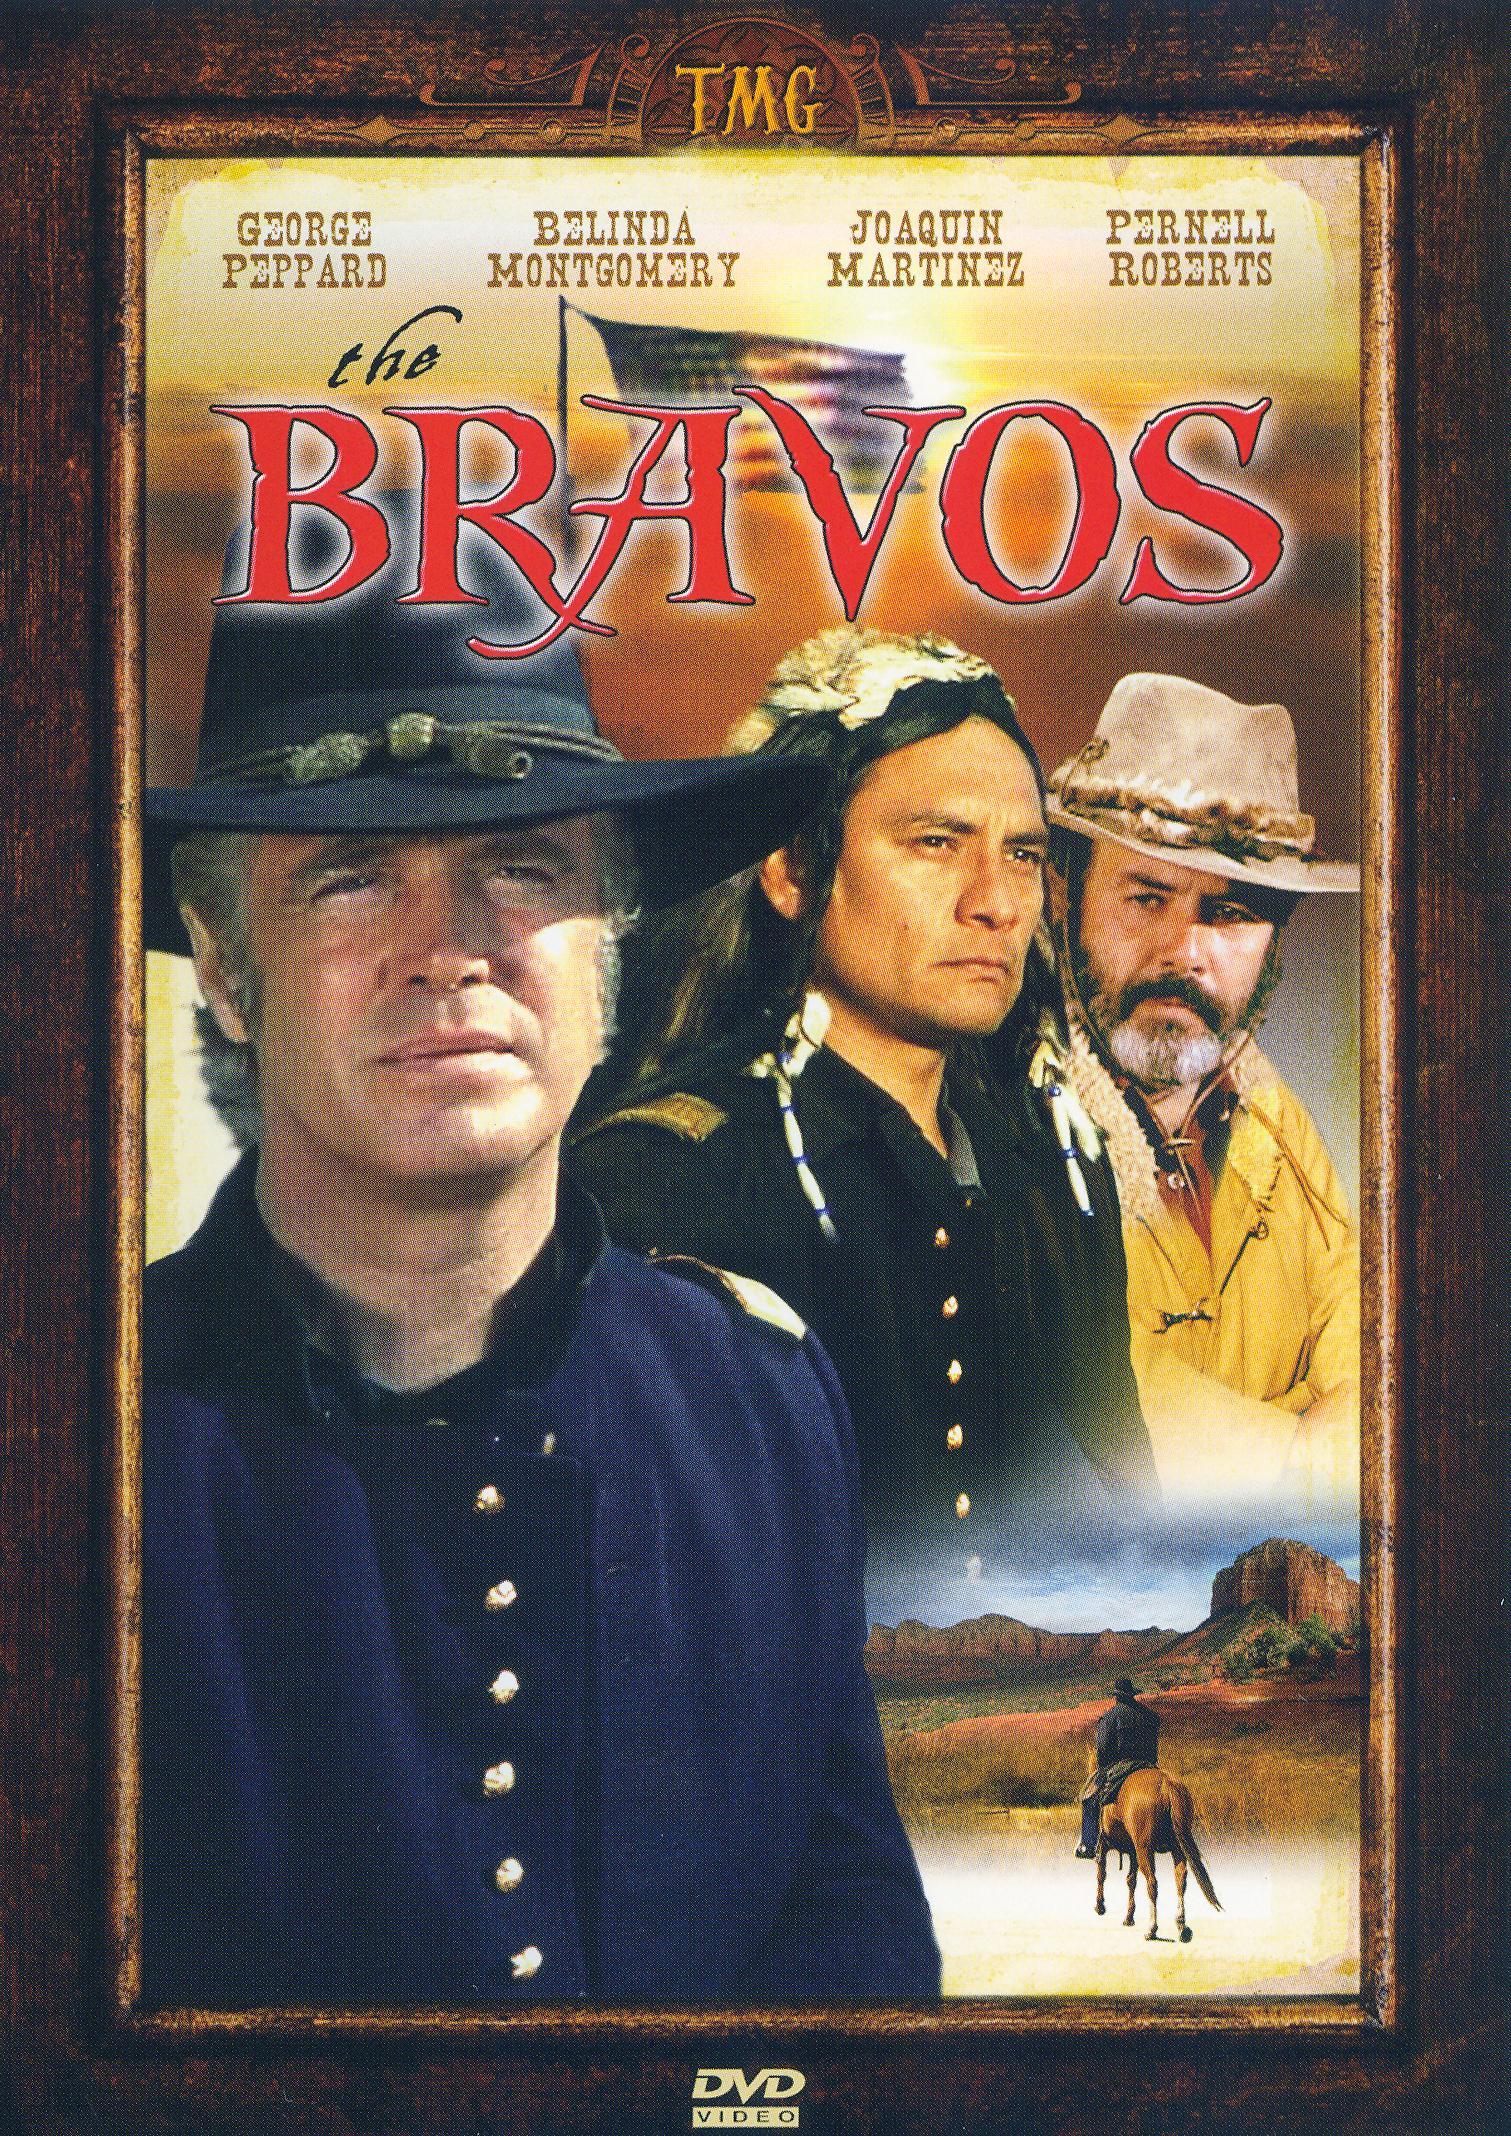 The Bravos (dvd) 16374601